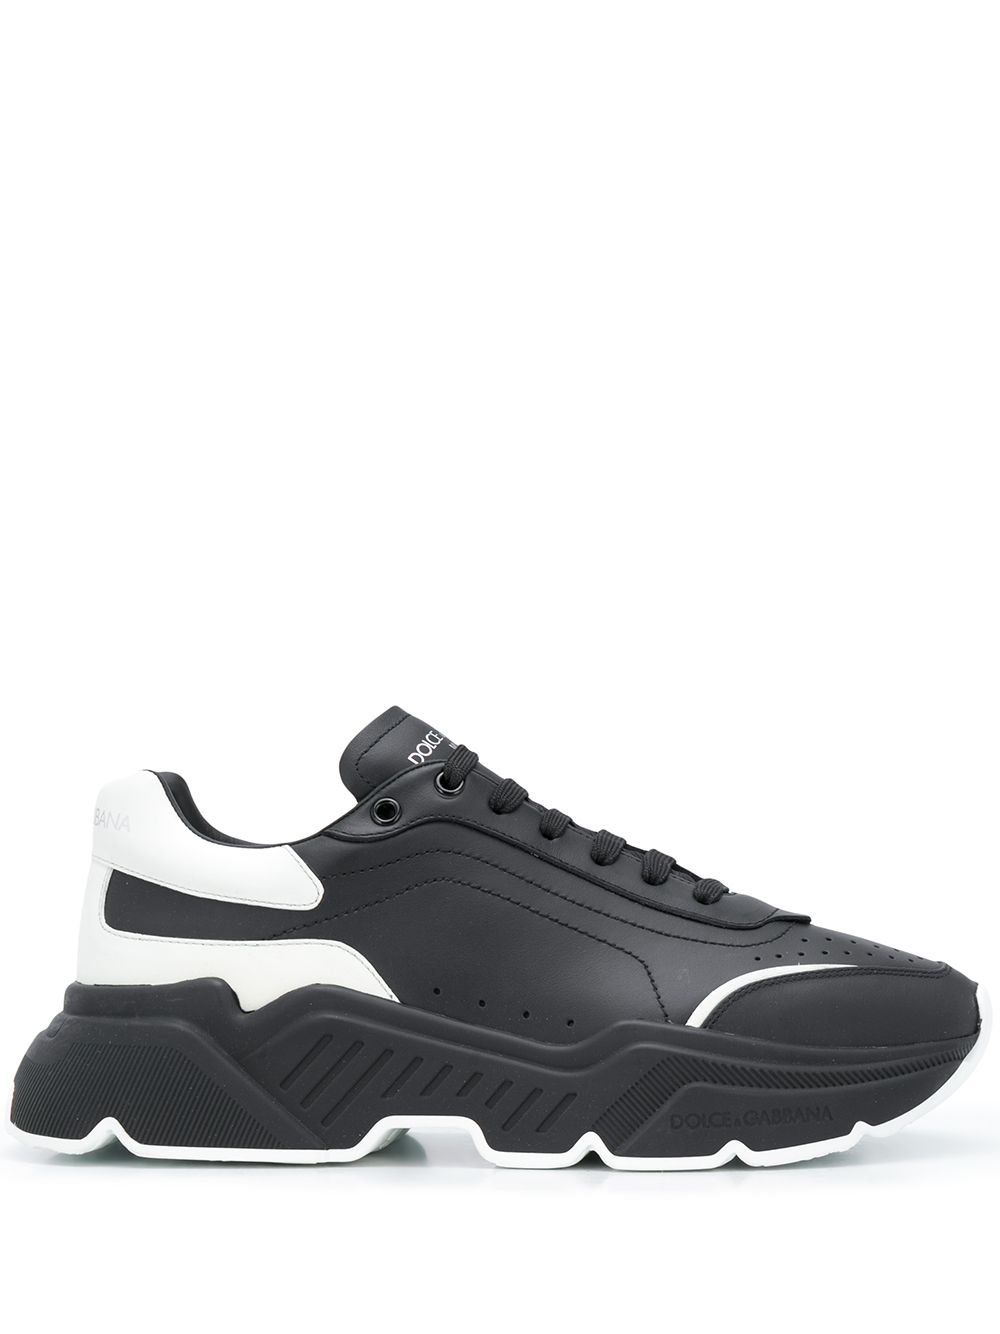 chunky sneakers Day Master nero bianco DOLCE & GABBANA | Sneakers | CS1791-AX58989690